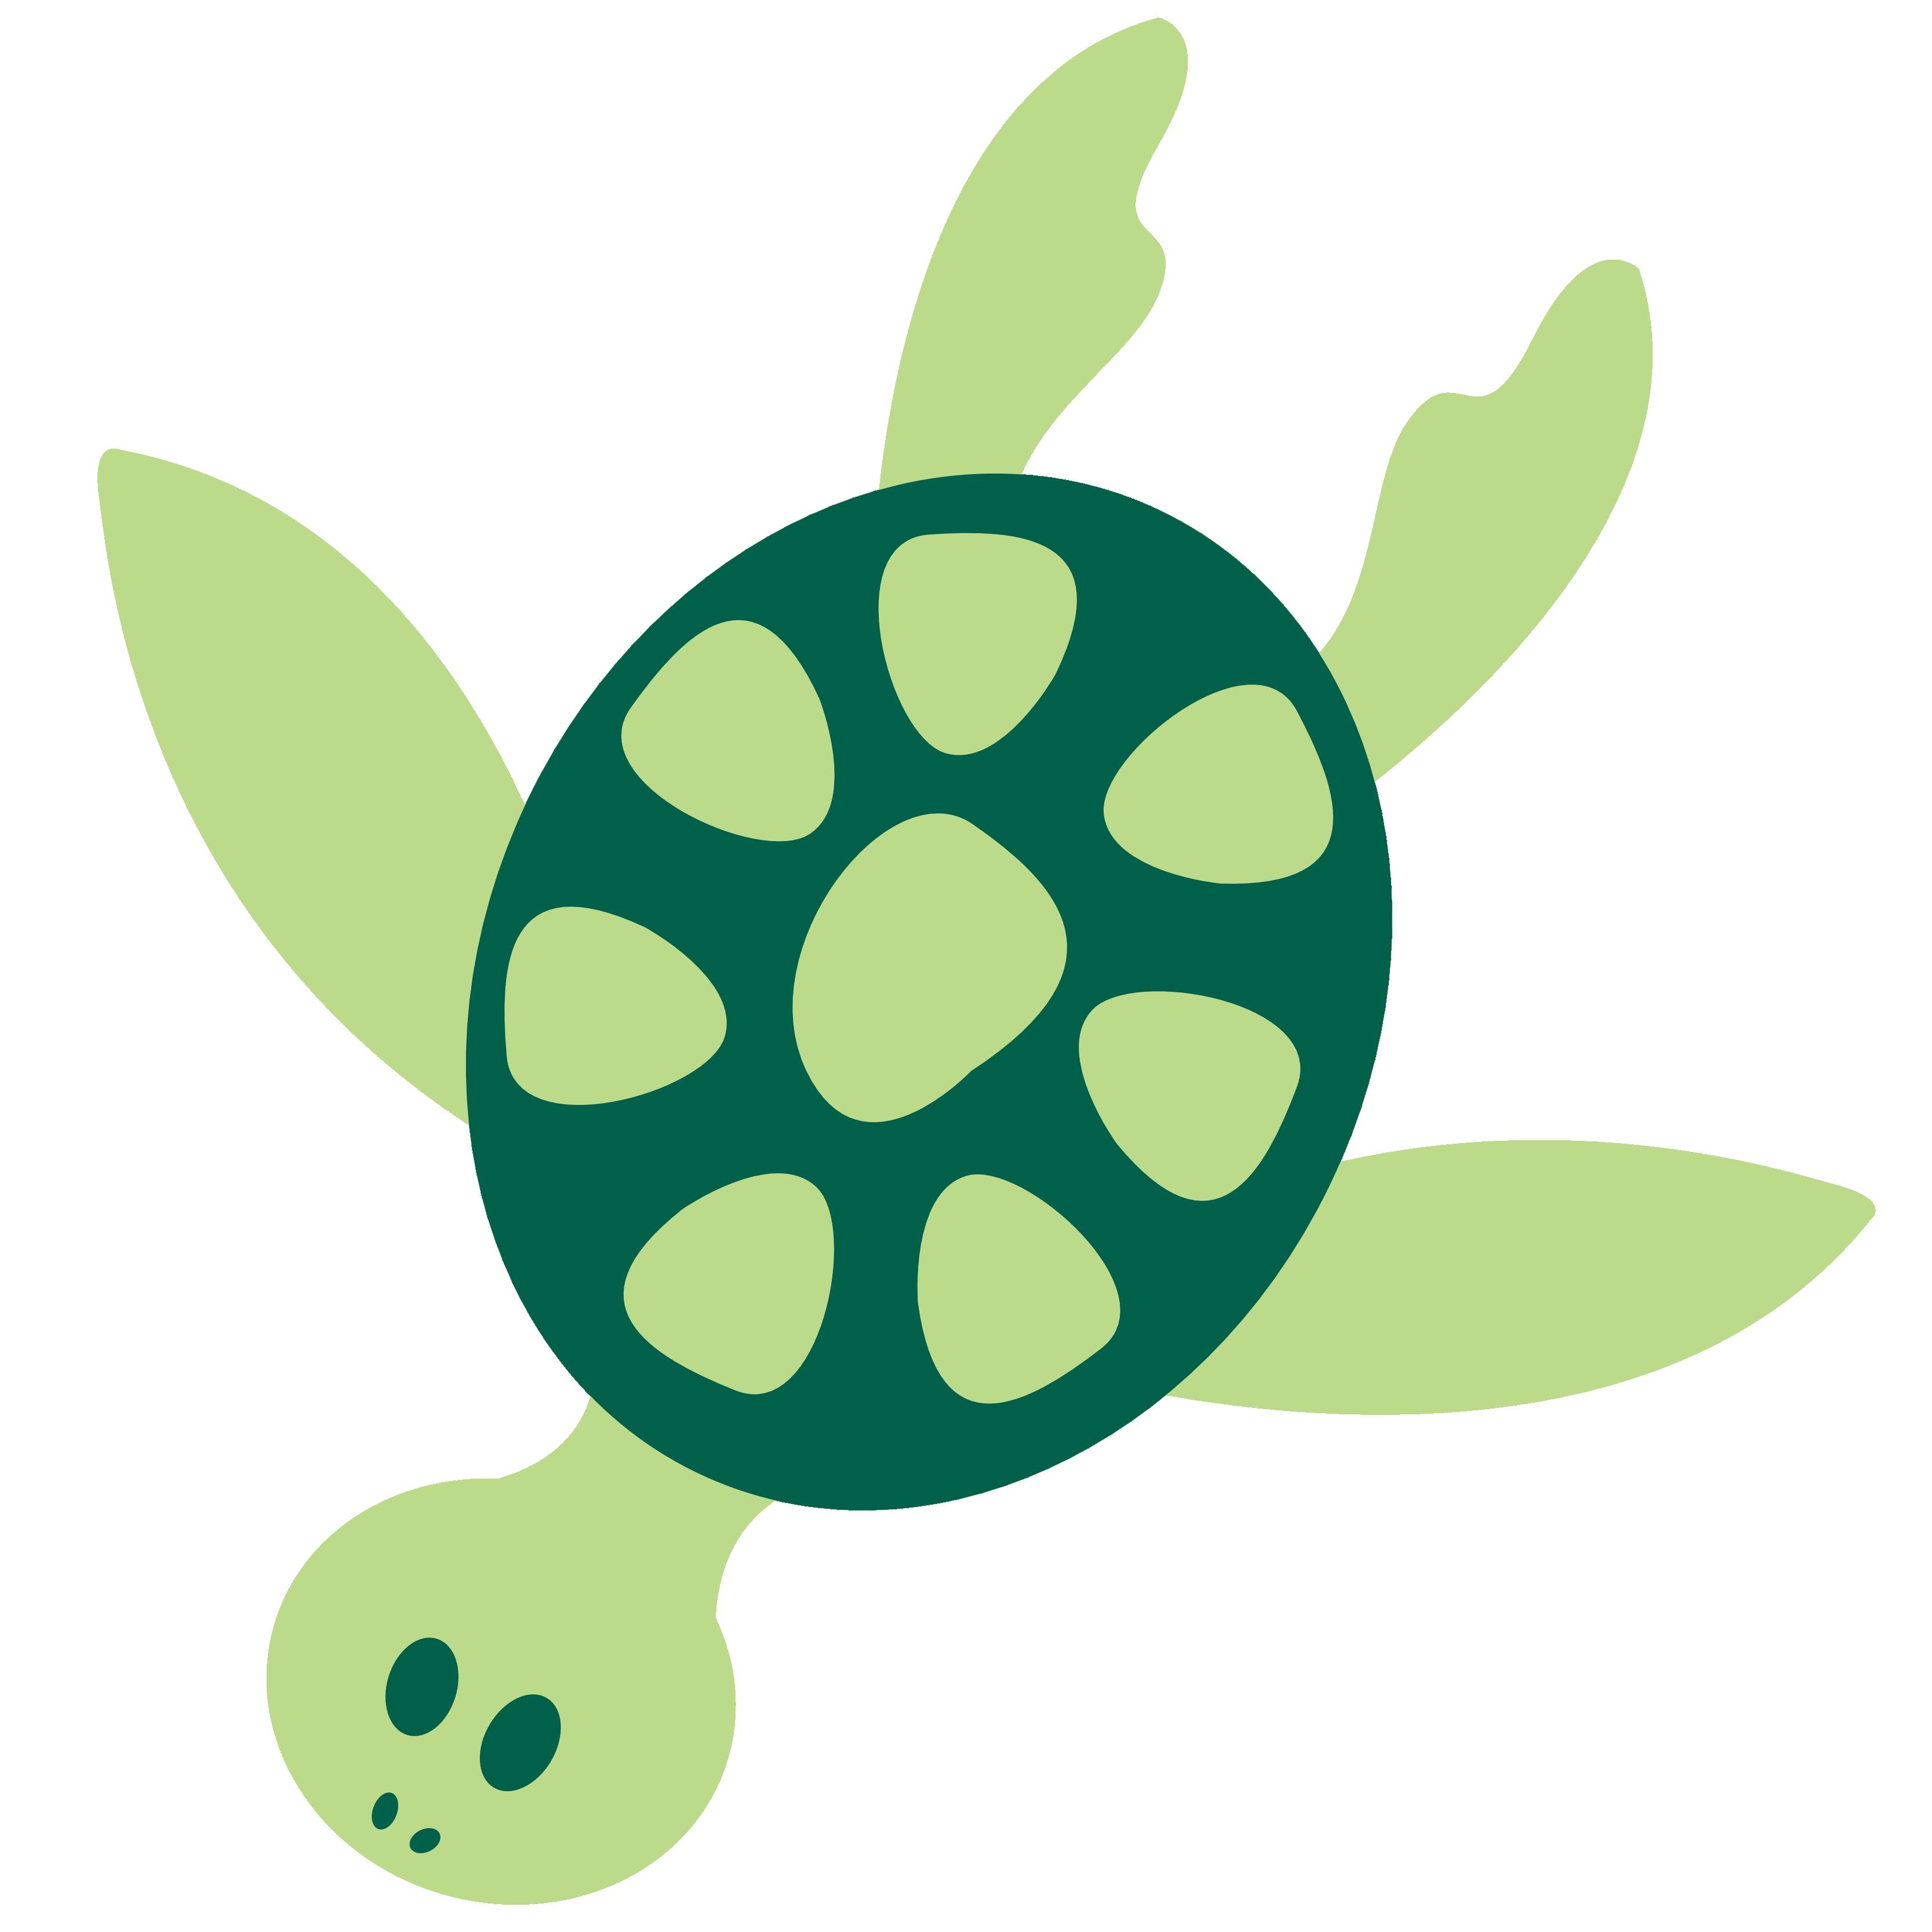 vector library library Hawaiian Turtle Clipart at GetDrawings